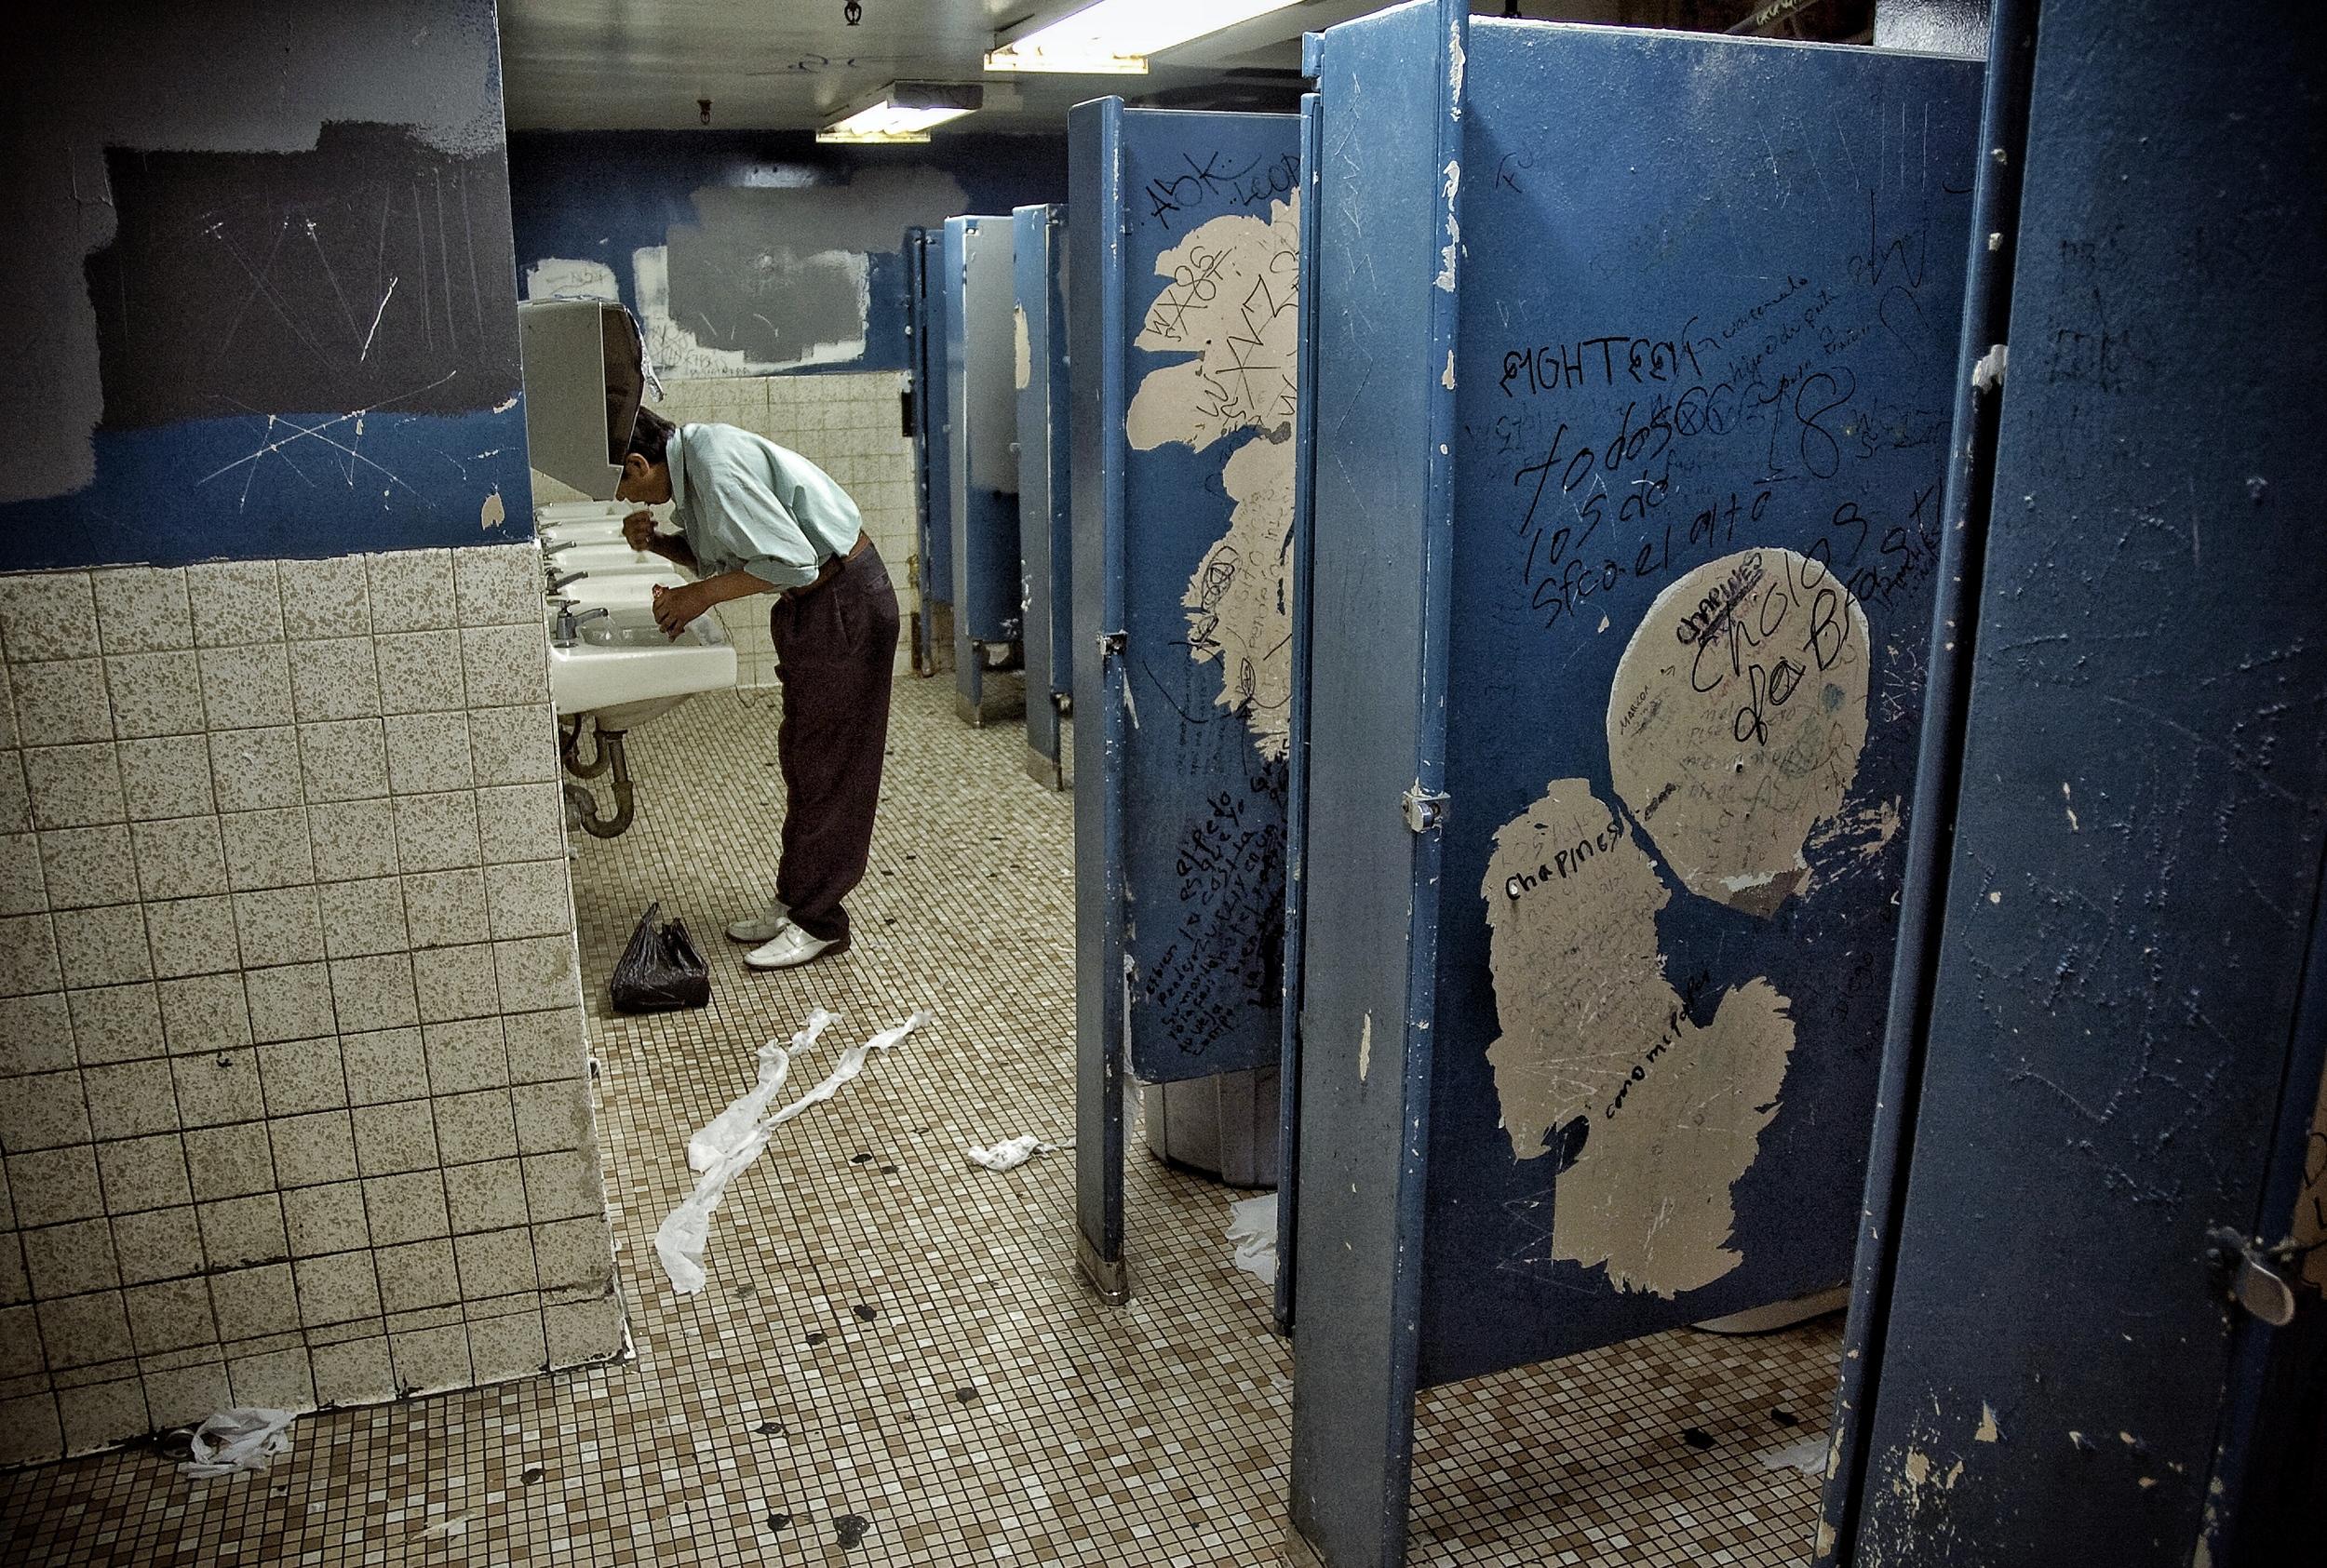 Sweatshop restroom